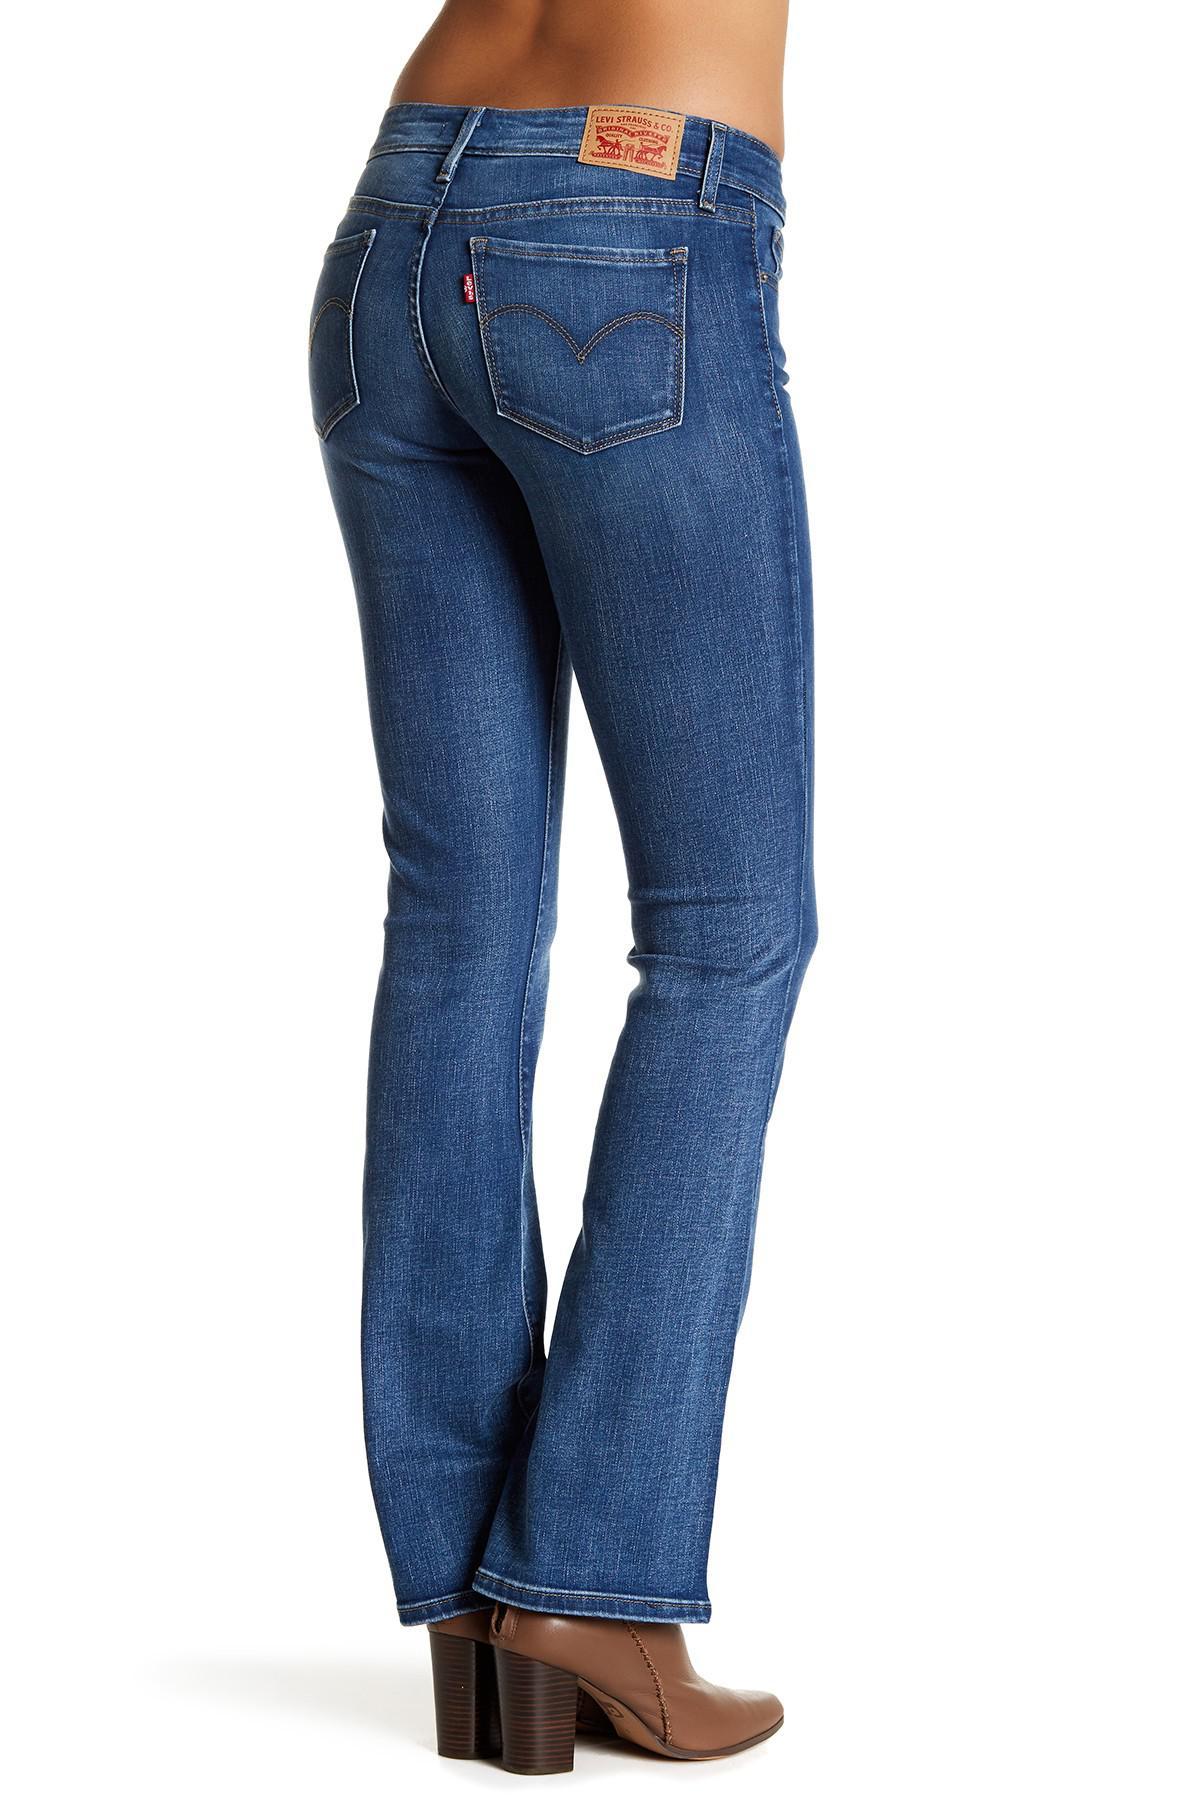 095735331e Lyst - Levi s 715 Bootcut Jean in Blue